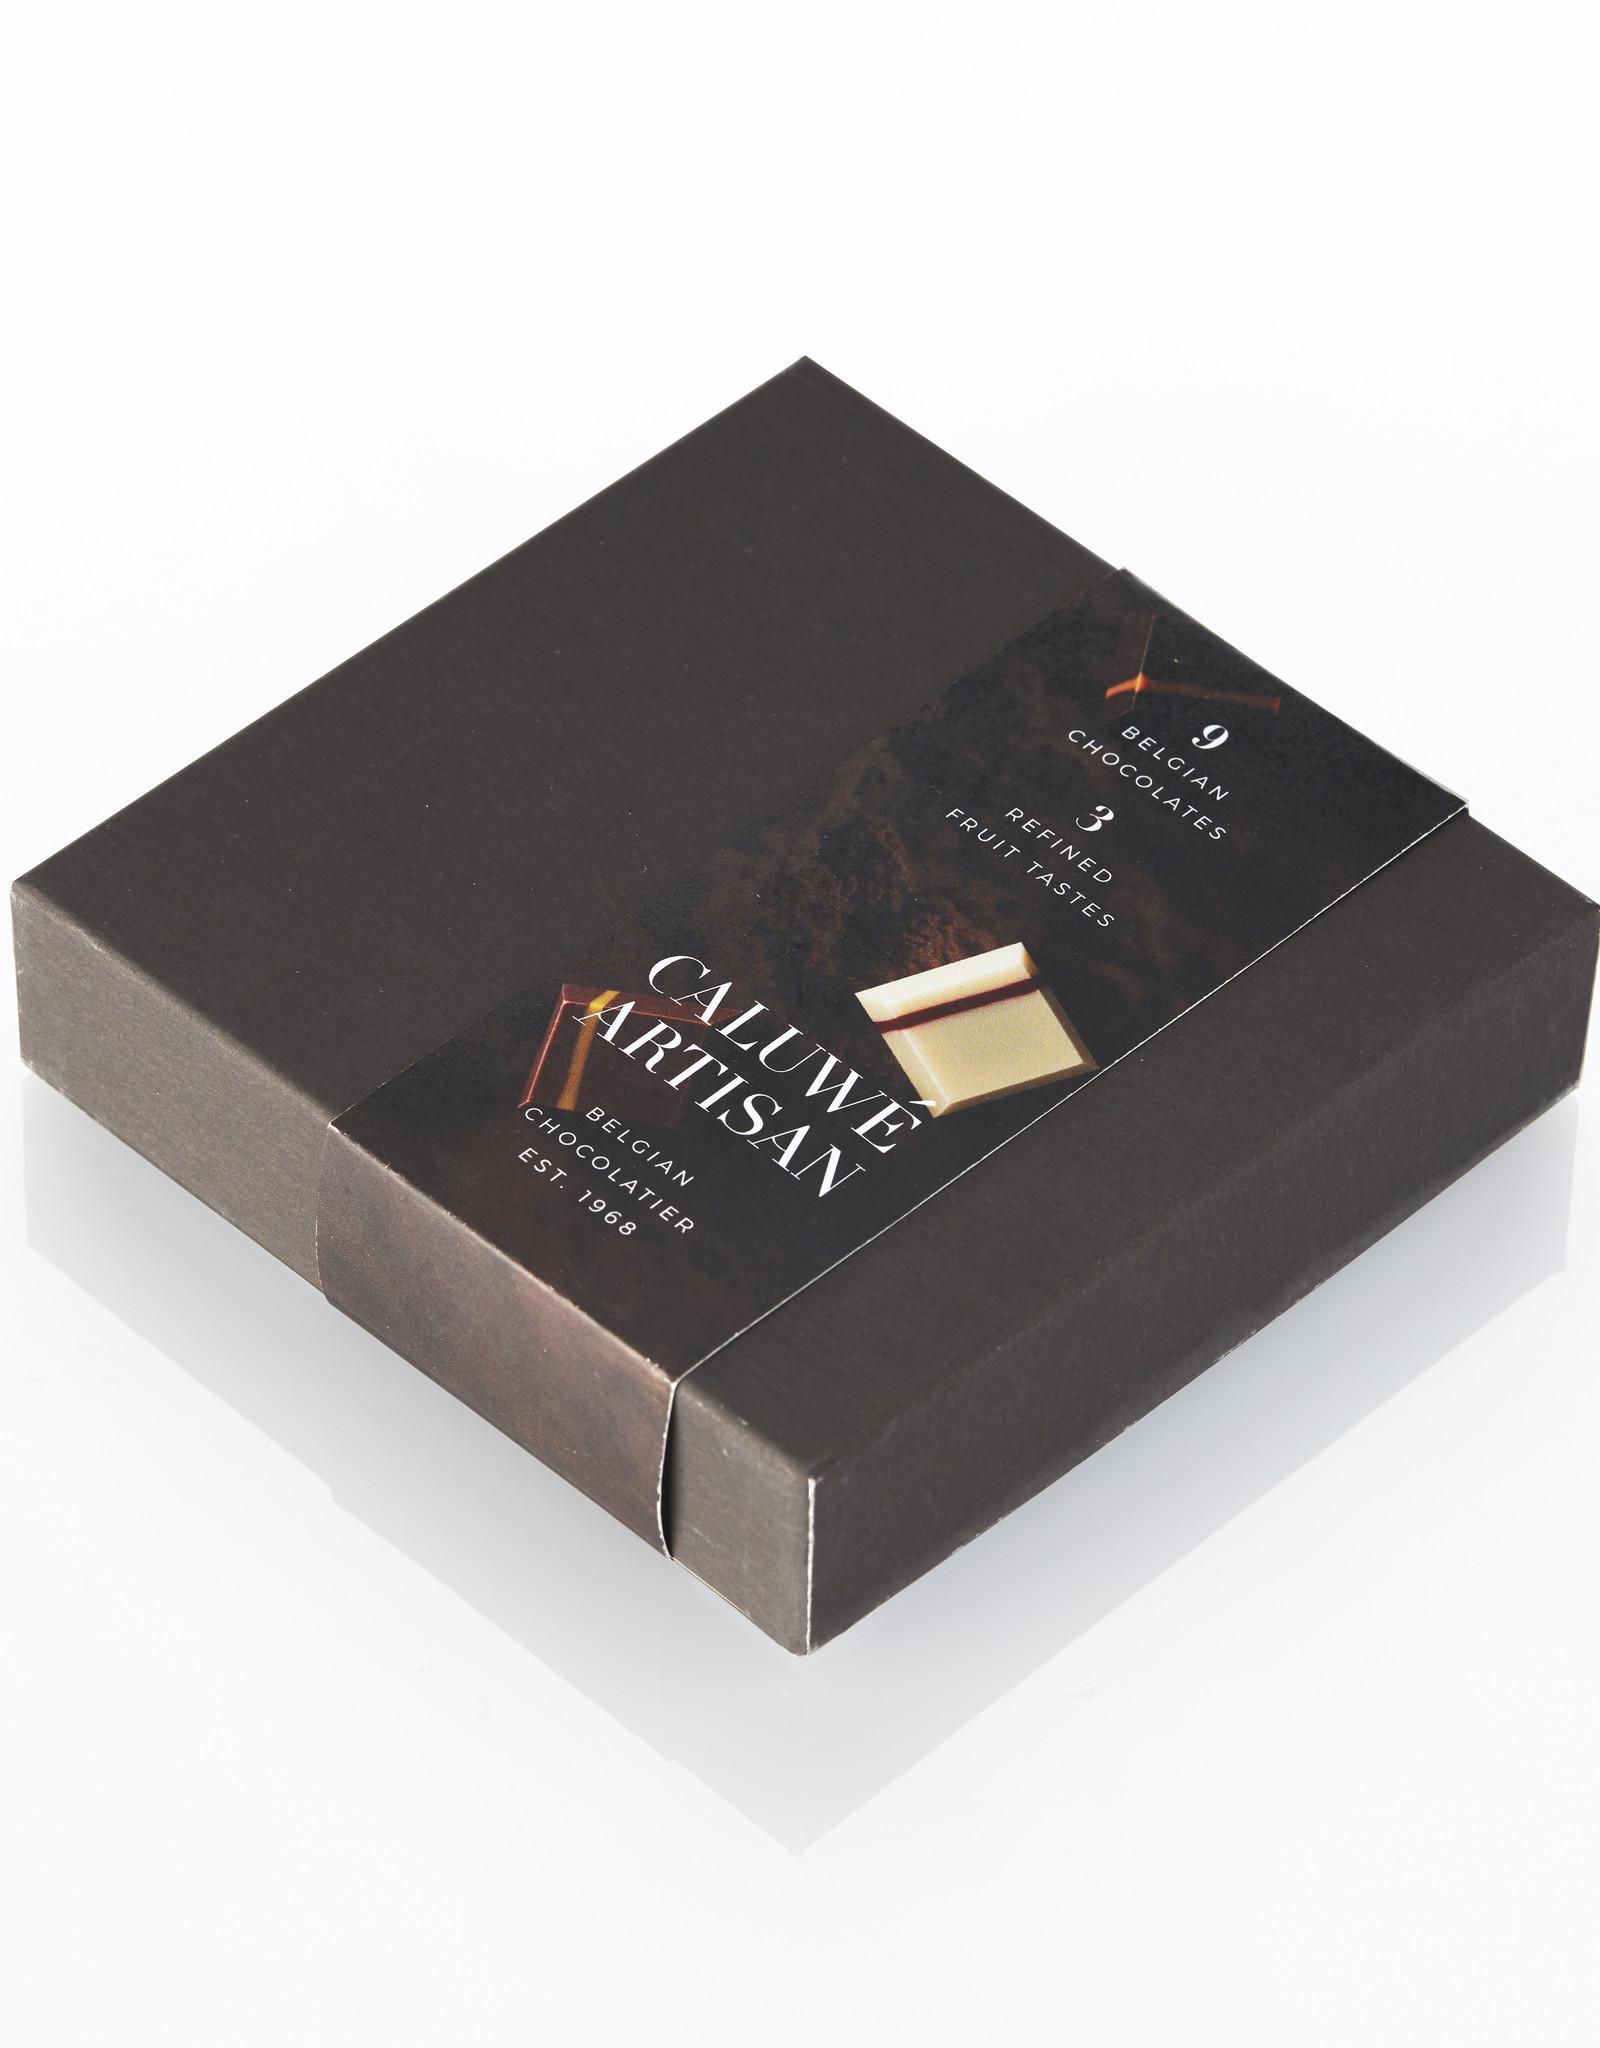 Caluwe Artisan Assortiment de 9 chocolats Belges fourrés avec saveur de fruits 105g